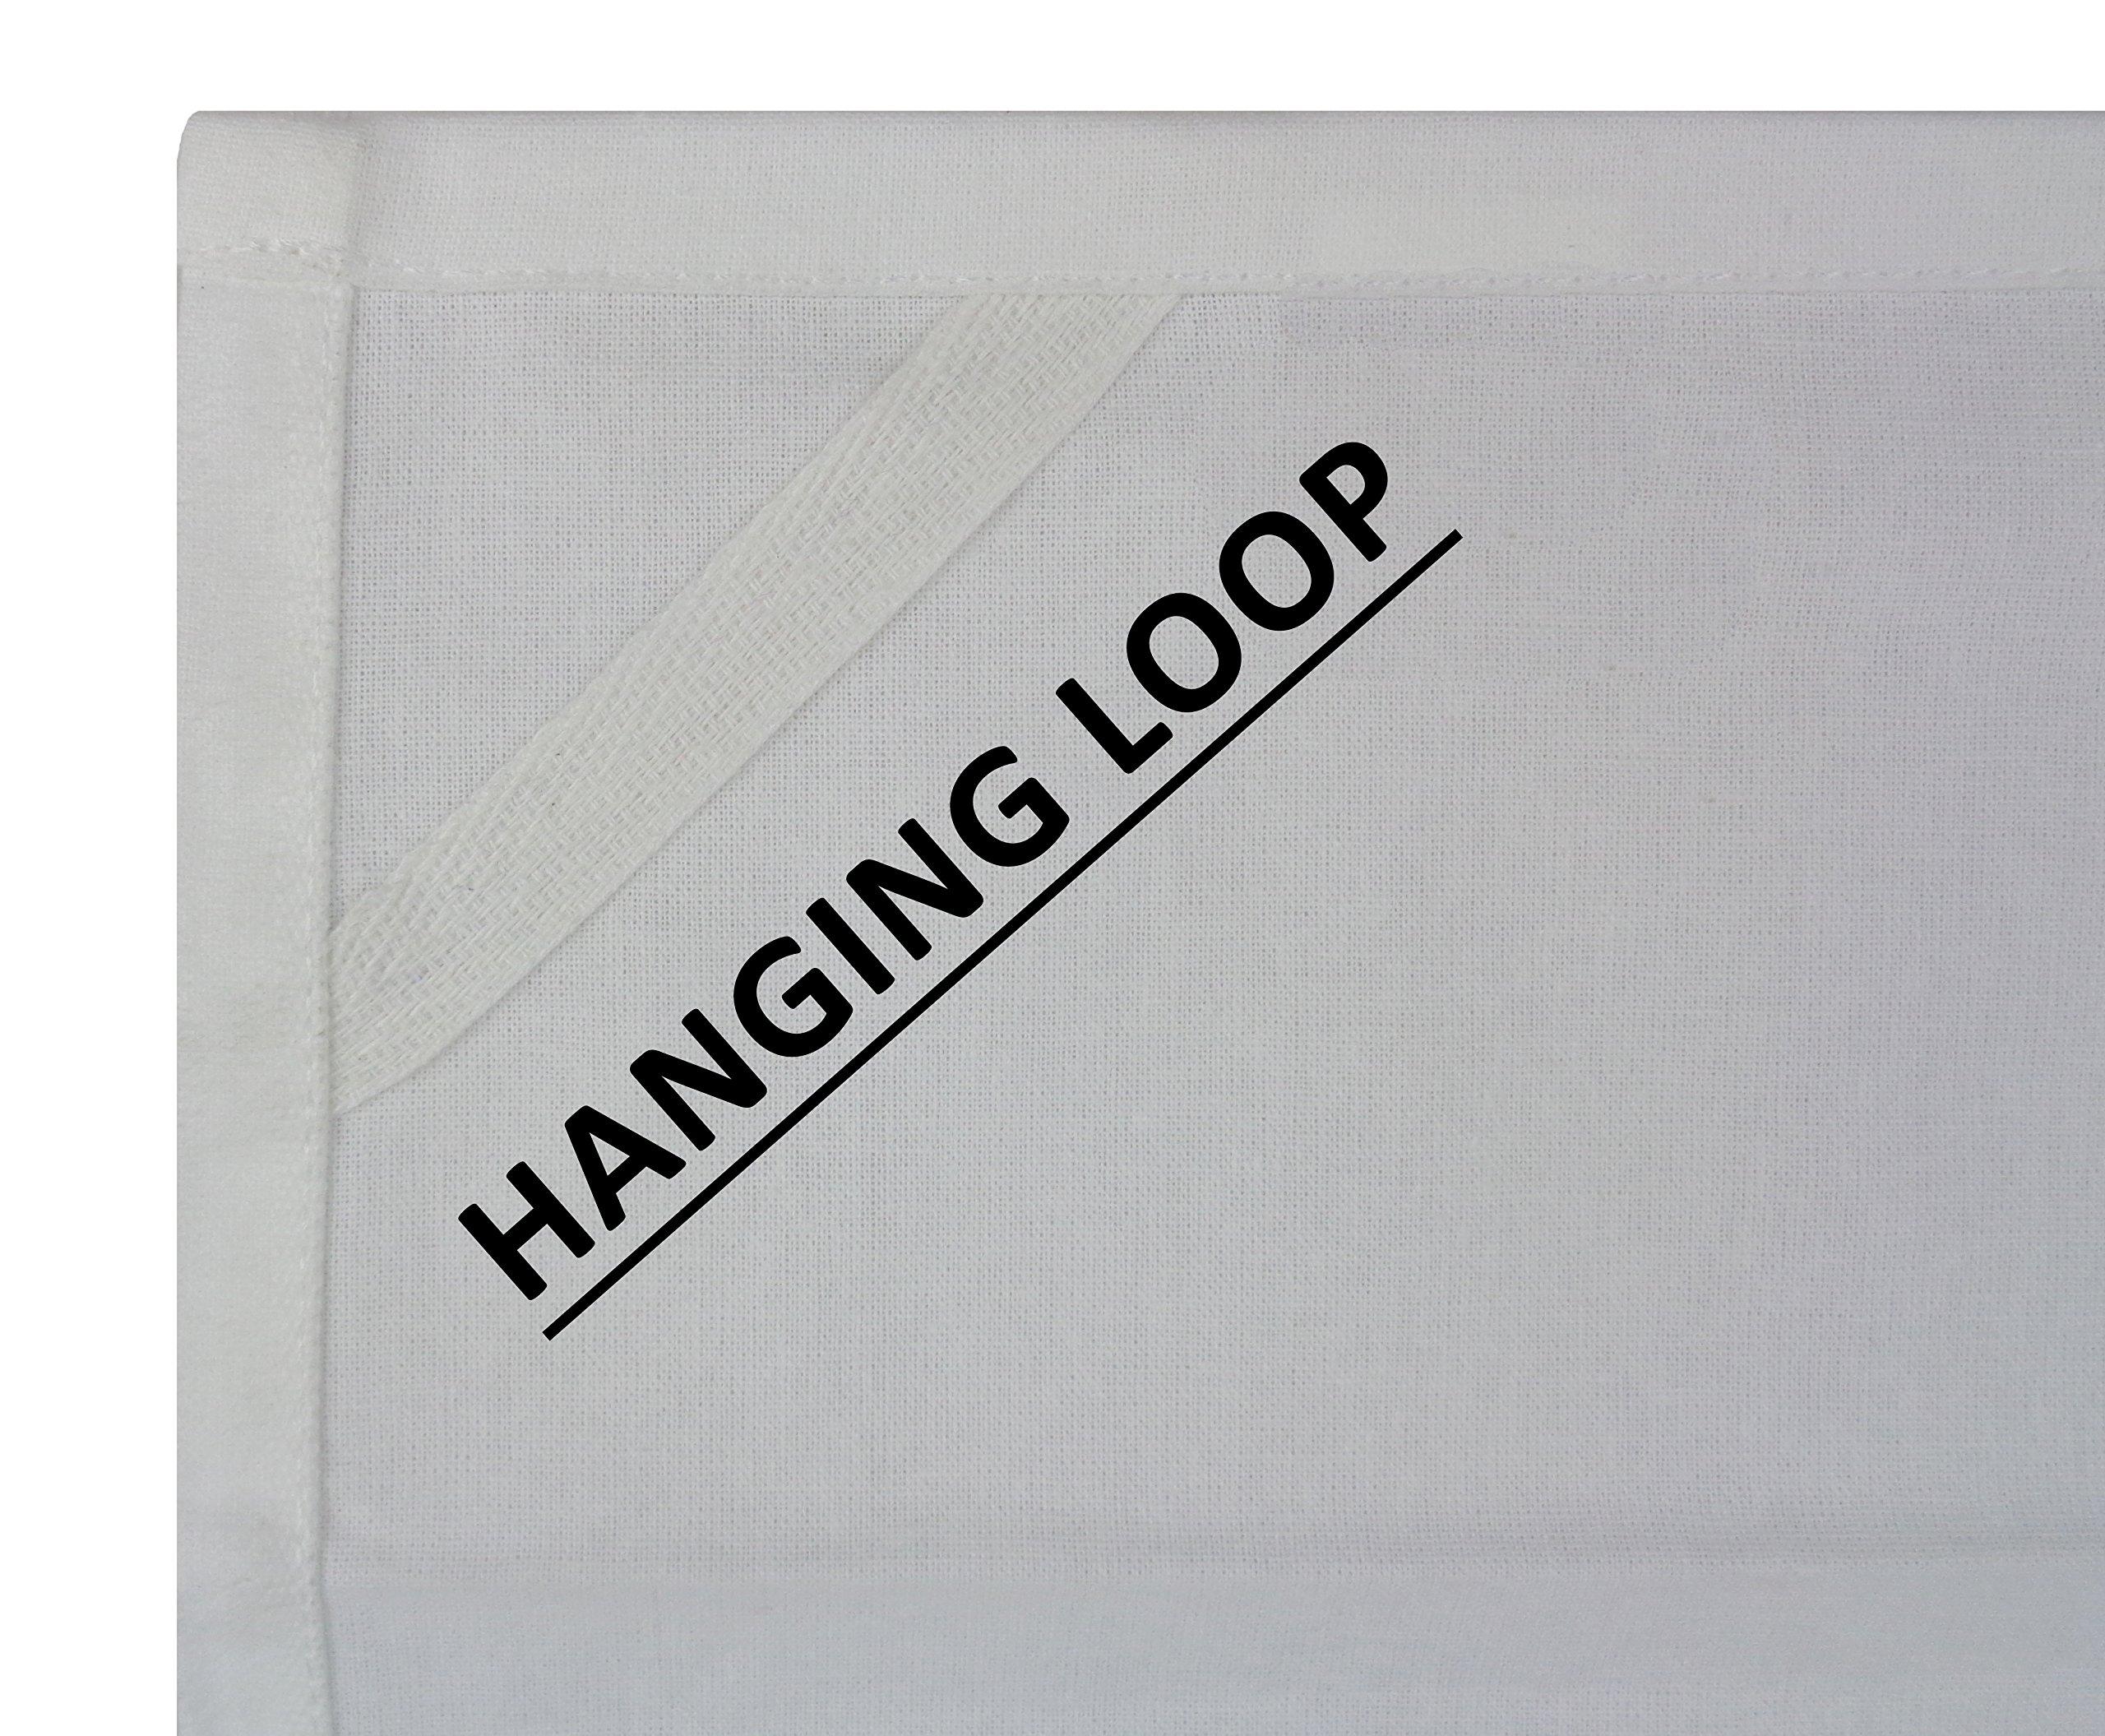 Cotton Craft 12 Pack Flour Sack Kitchen Towel Napkins - 100% Pure Ringspun Cotton - White - 28x28 Heavy Weight 900 Gram / 32 Ounce Woven Low Lint Construction - Multi Purpose & Versatile by Cotton Craft (Image #1)